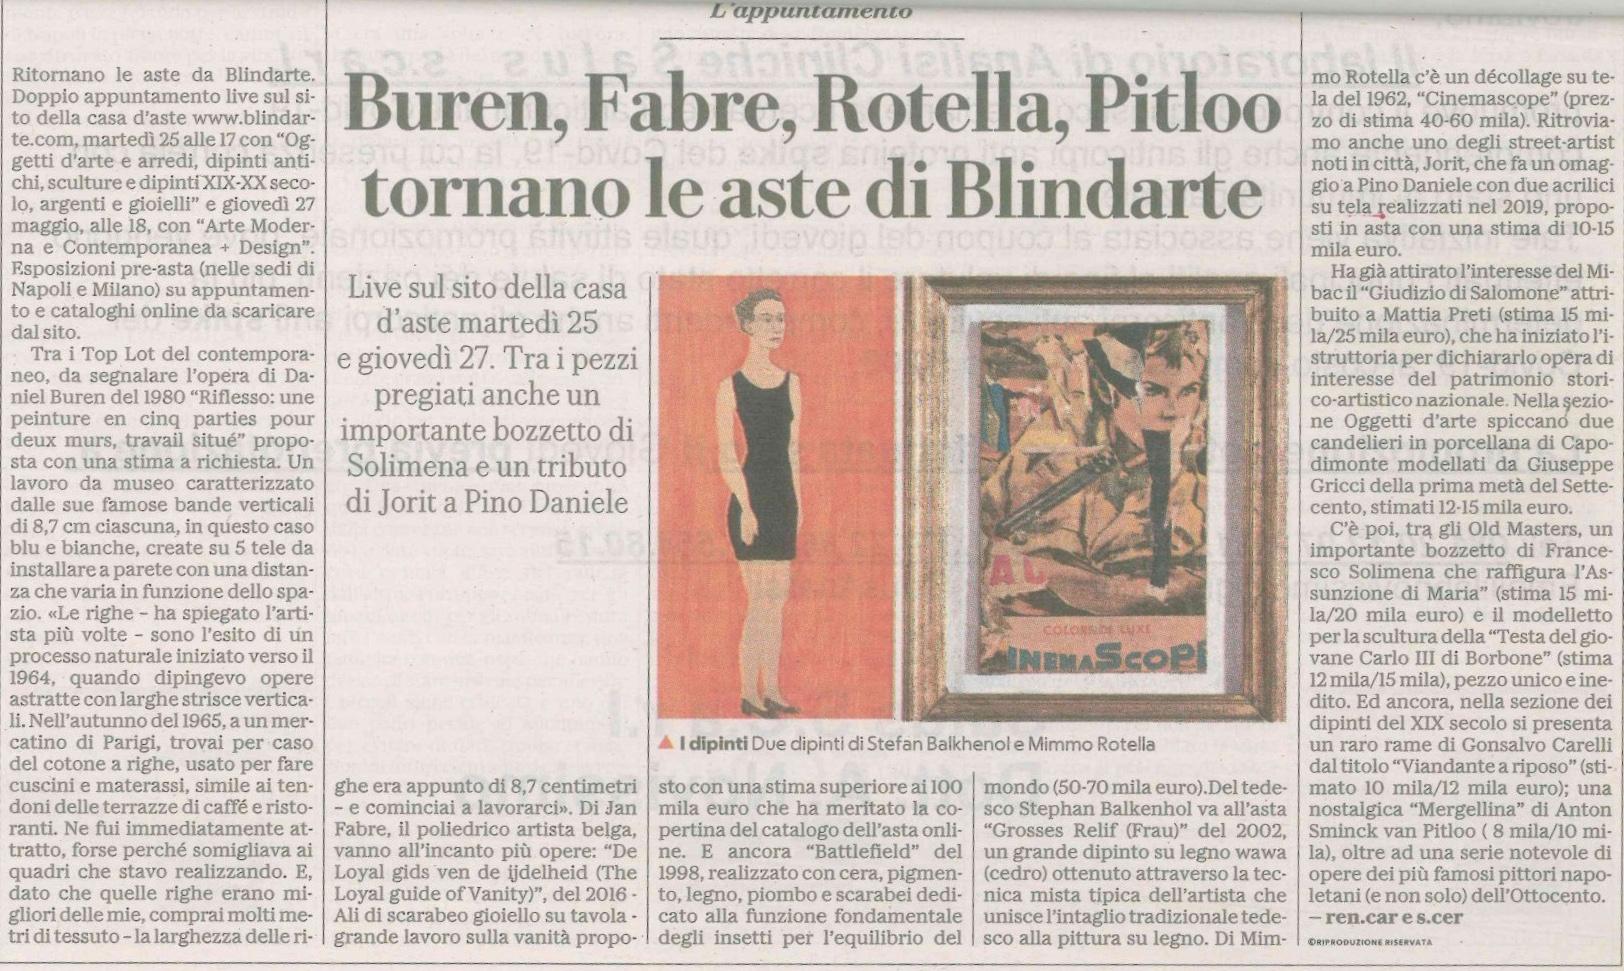 https://www.blindarte.com/Images/Uimages/_Repubblica.jpg